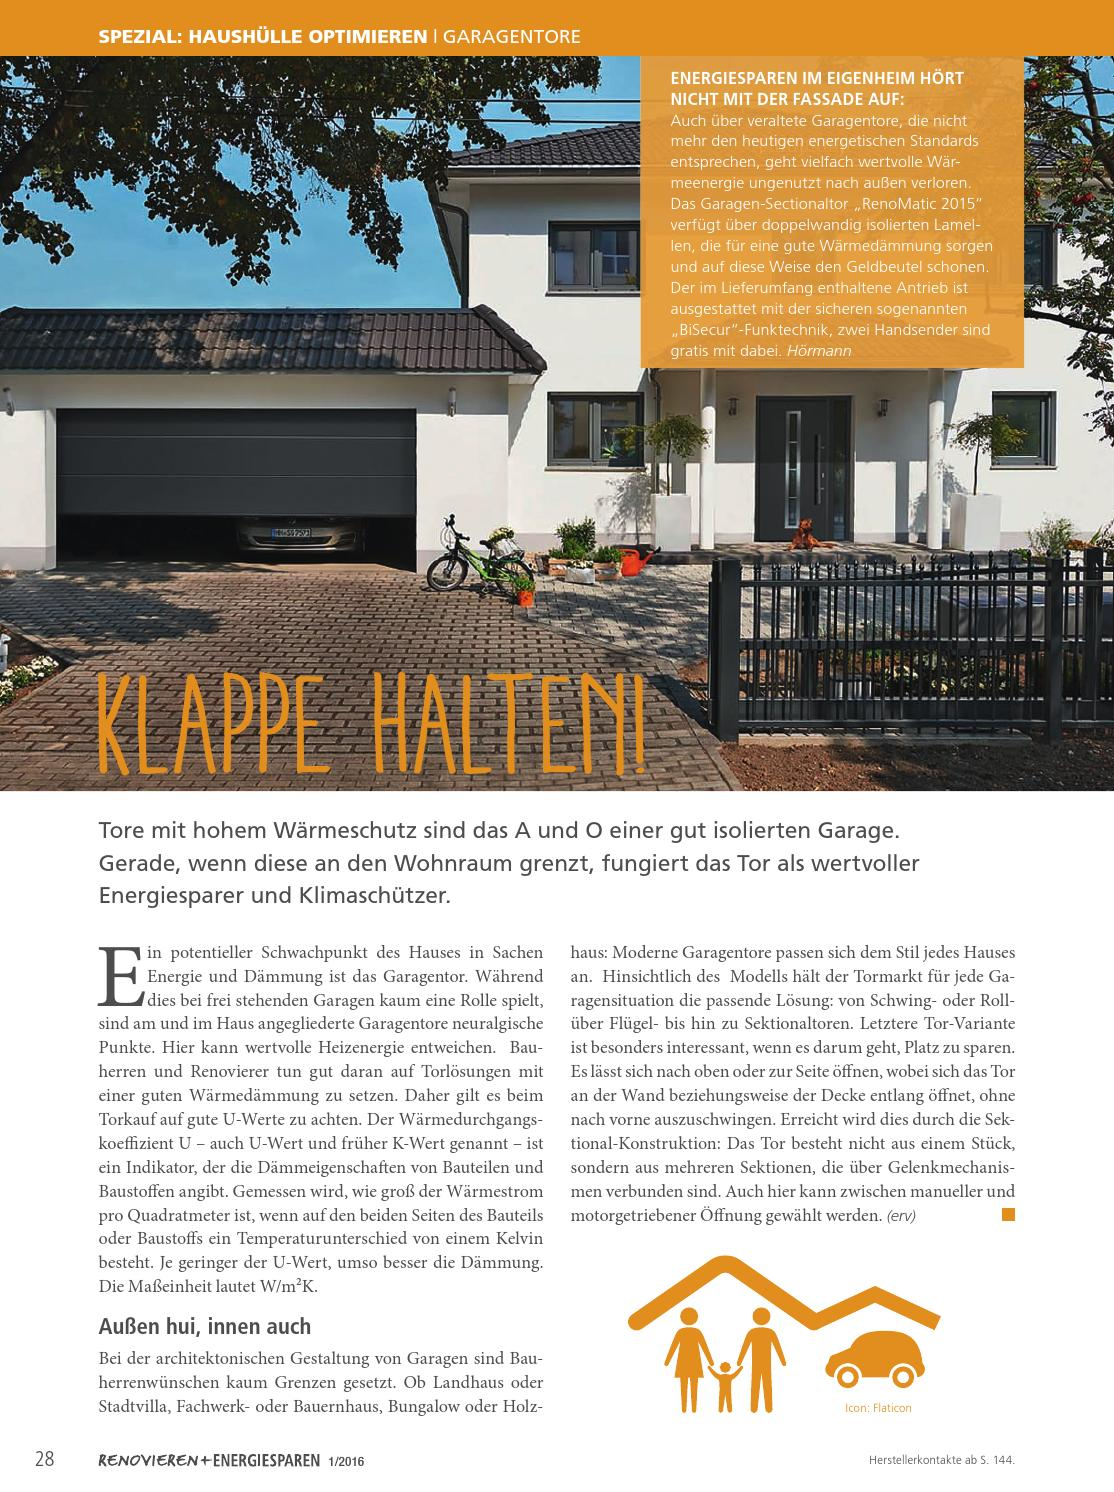 Renovieren U0026 Energiesparen 1/2016 By Family Home Verlag GmbH   Issuu